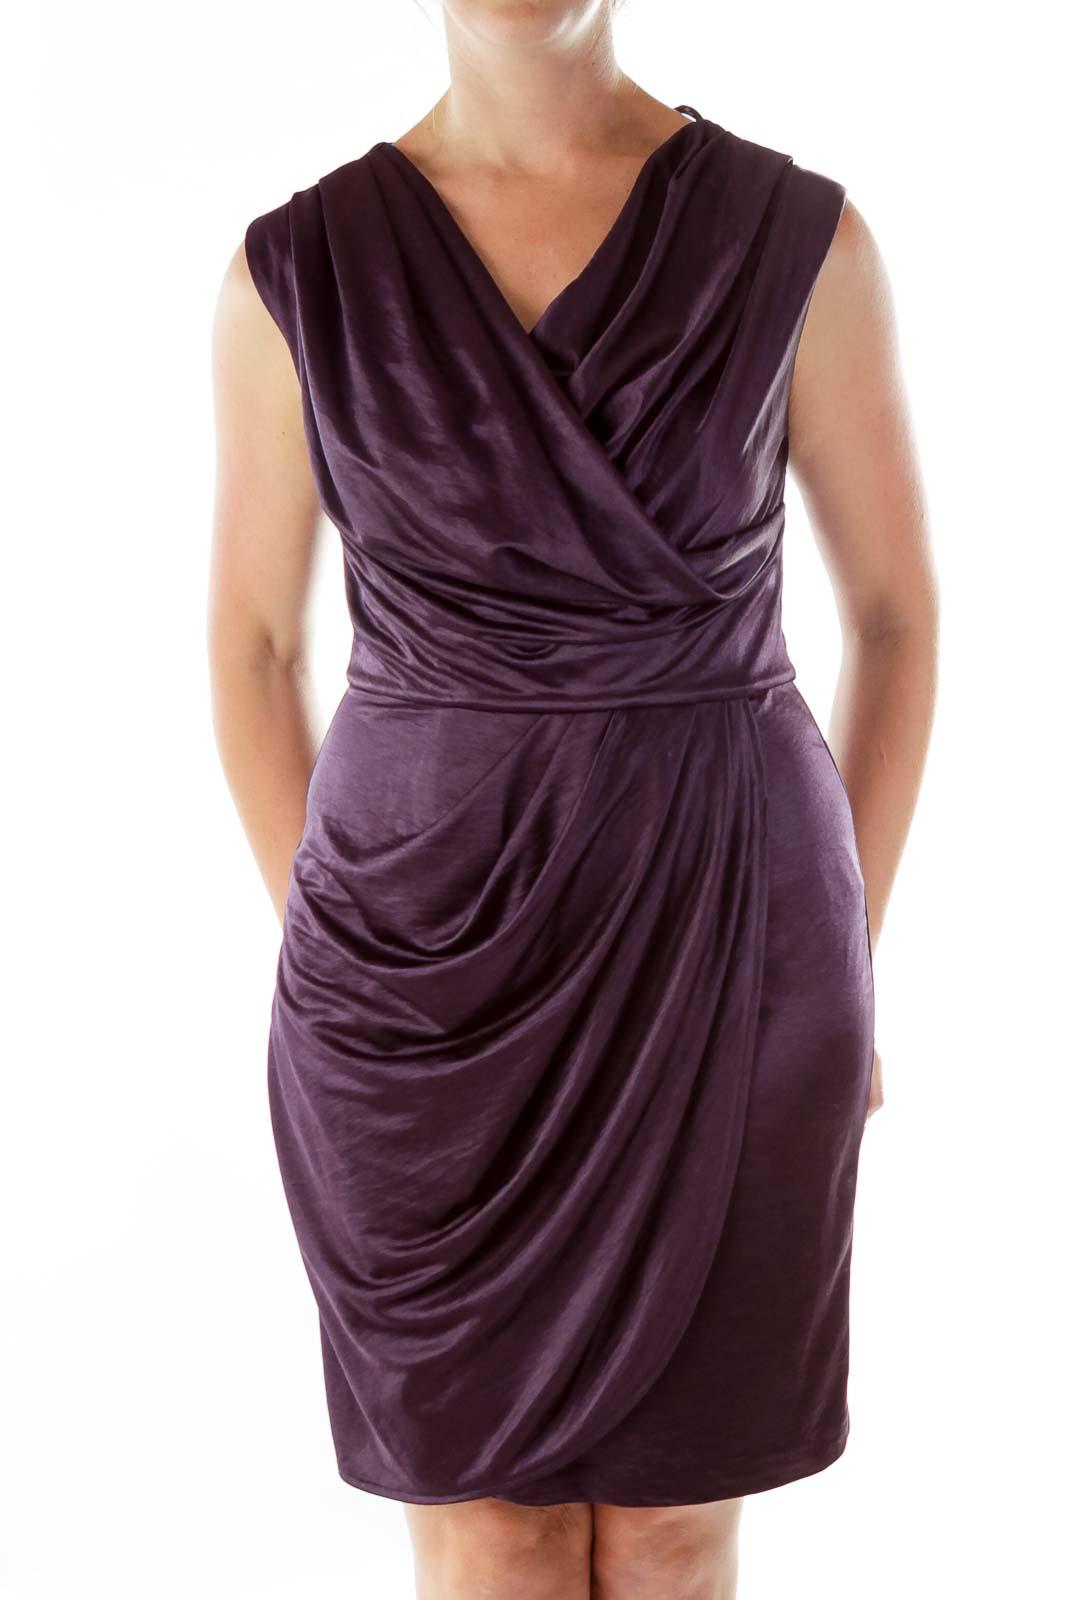 Purple Satin Crepe Dress Front